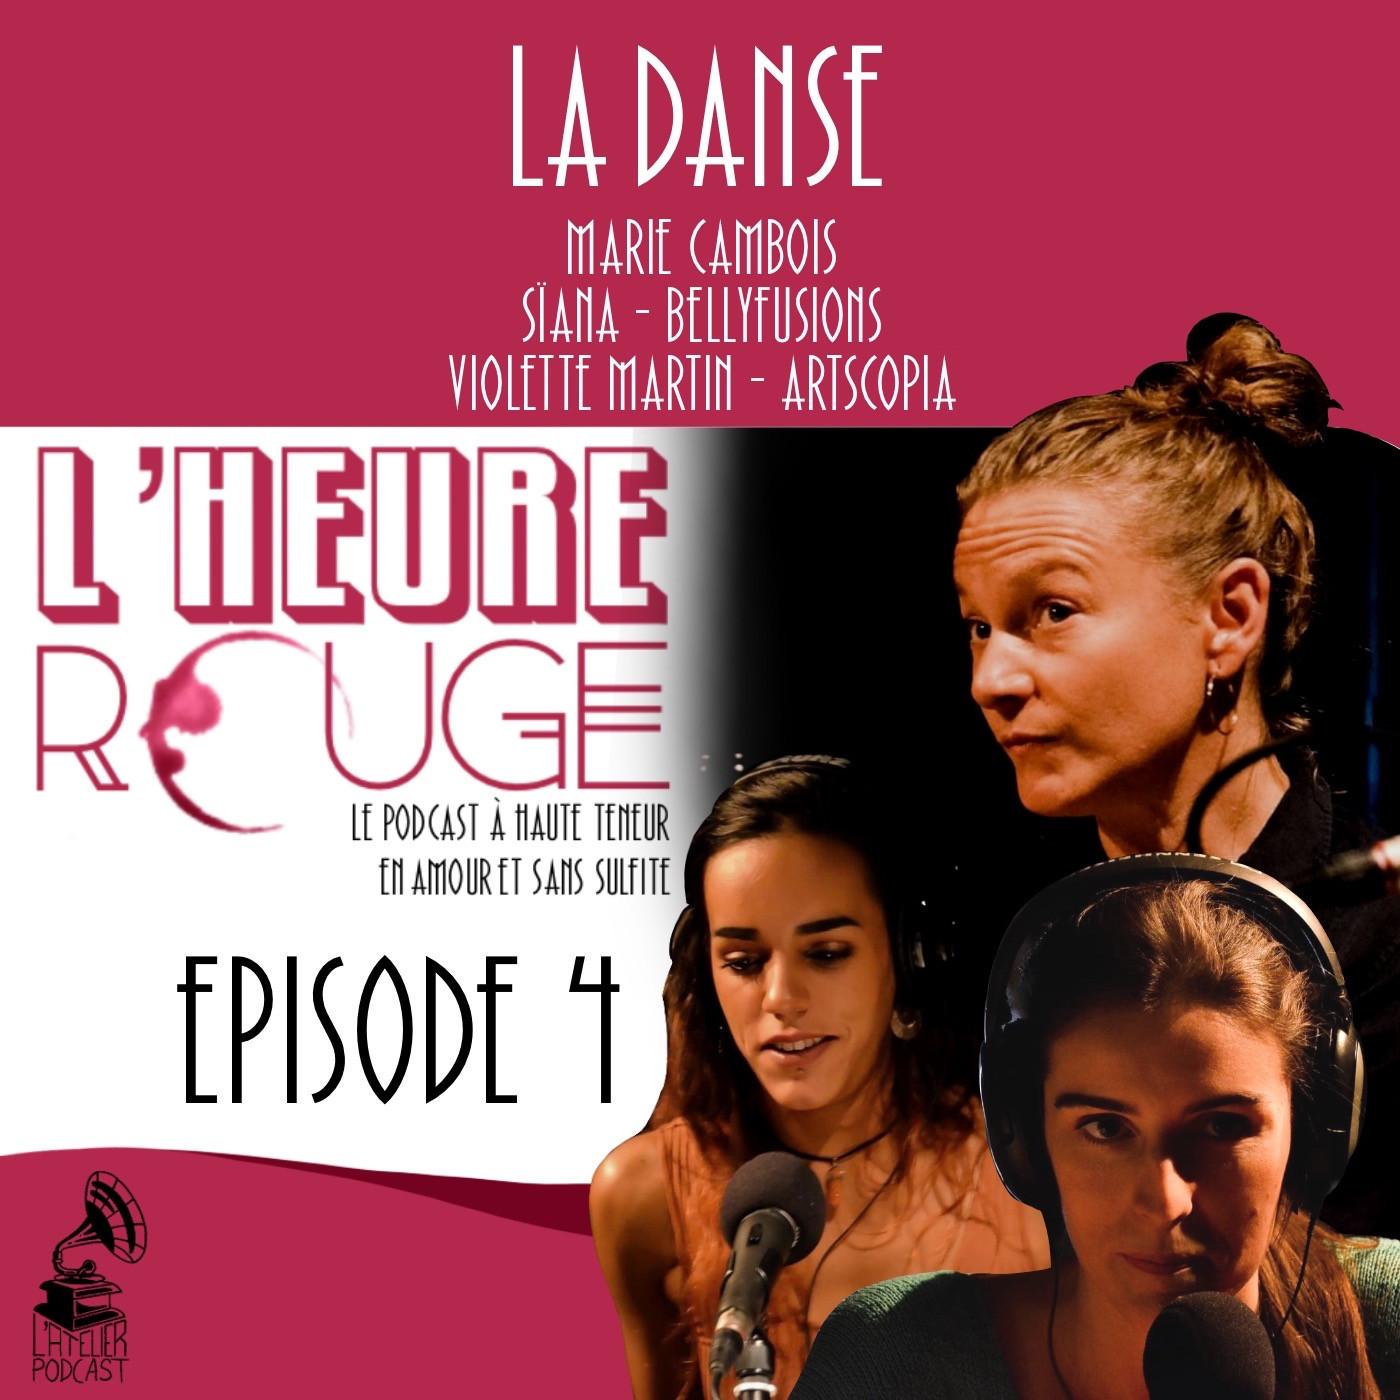 Episode 4 - La danse